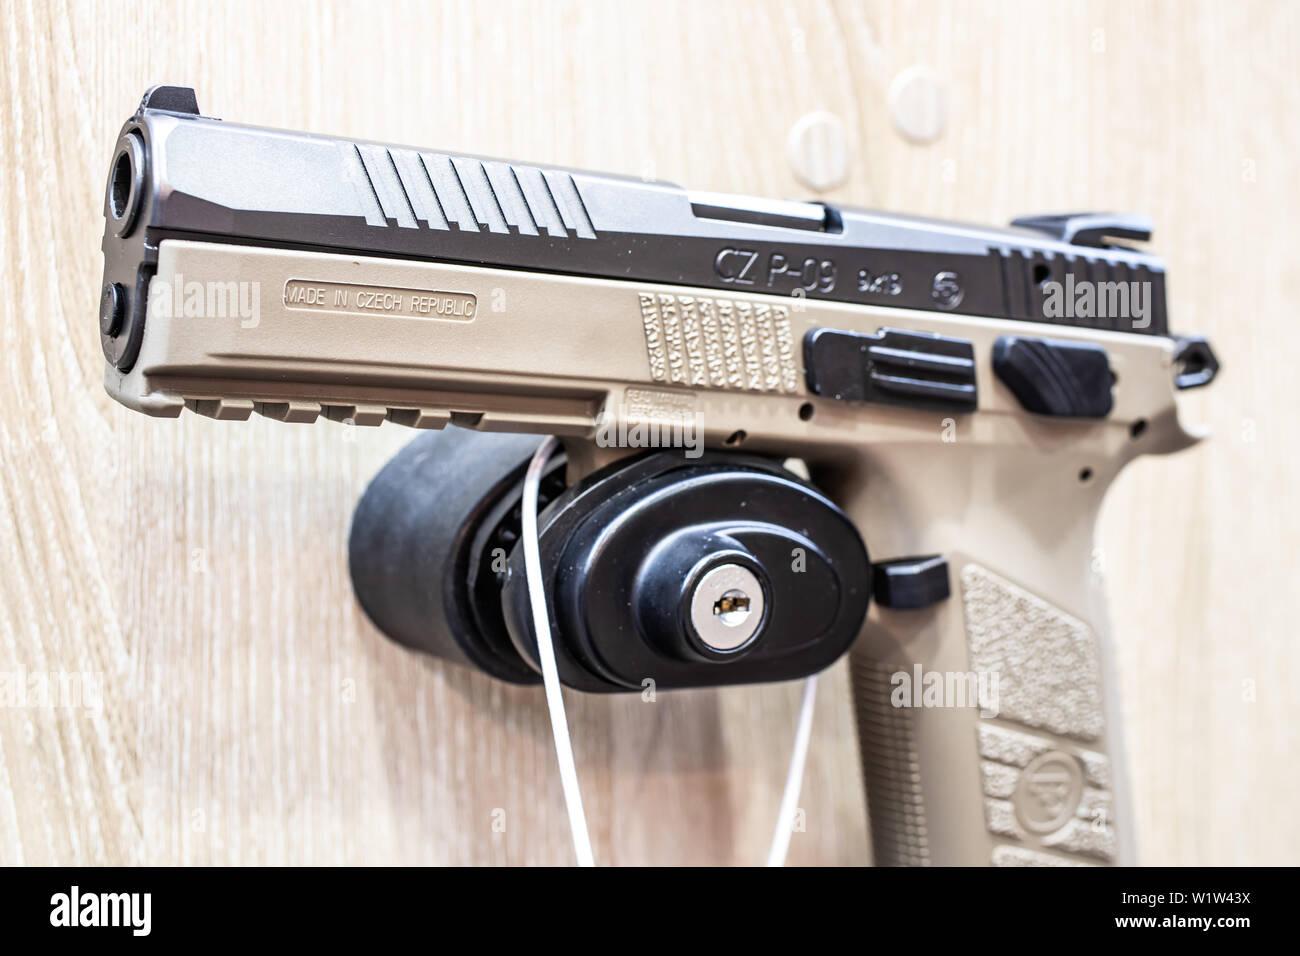 Poznan, Poland, Feb 2019 CZ semi-automatic pistol made by Czech firearm manufacturer CZUB in Czech Republic, exposition, KNIEJE Hunting shooting fair - Stock Image